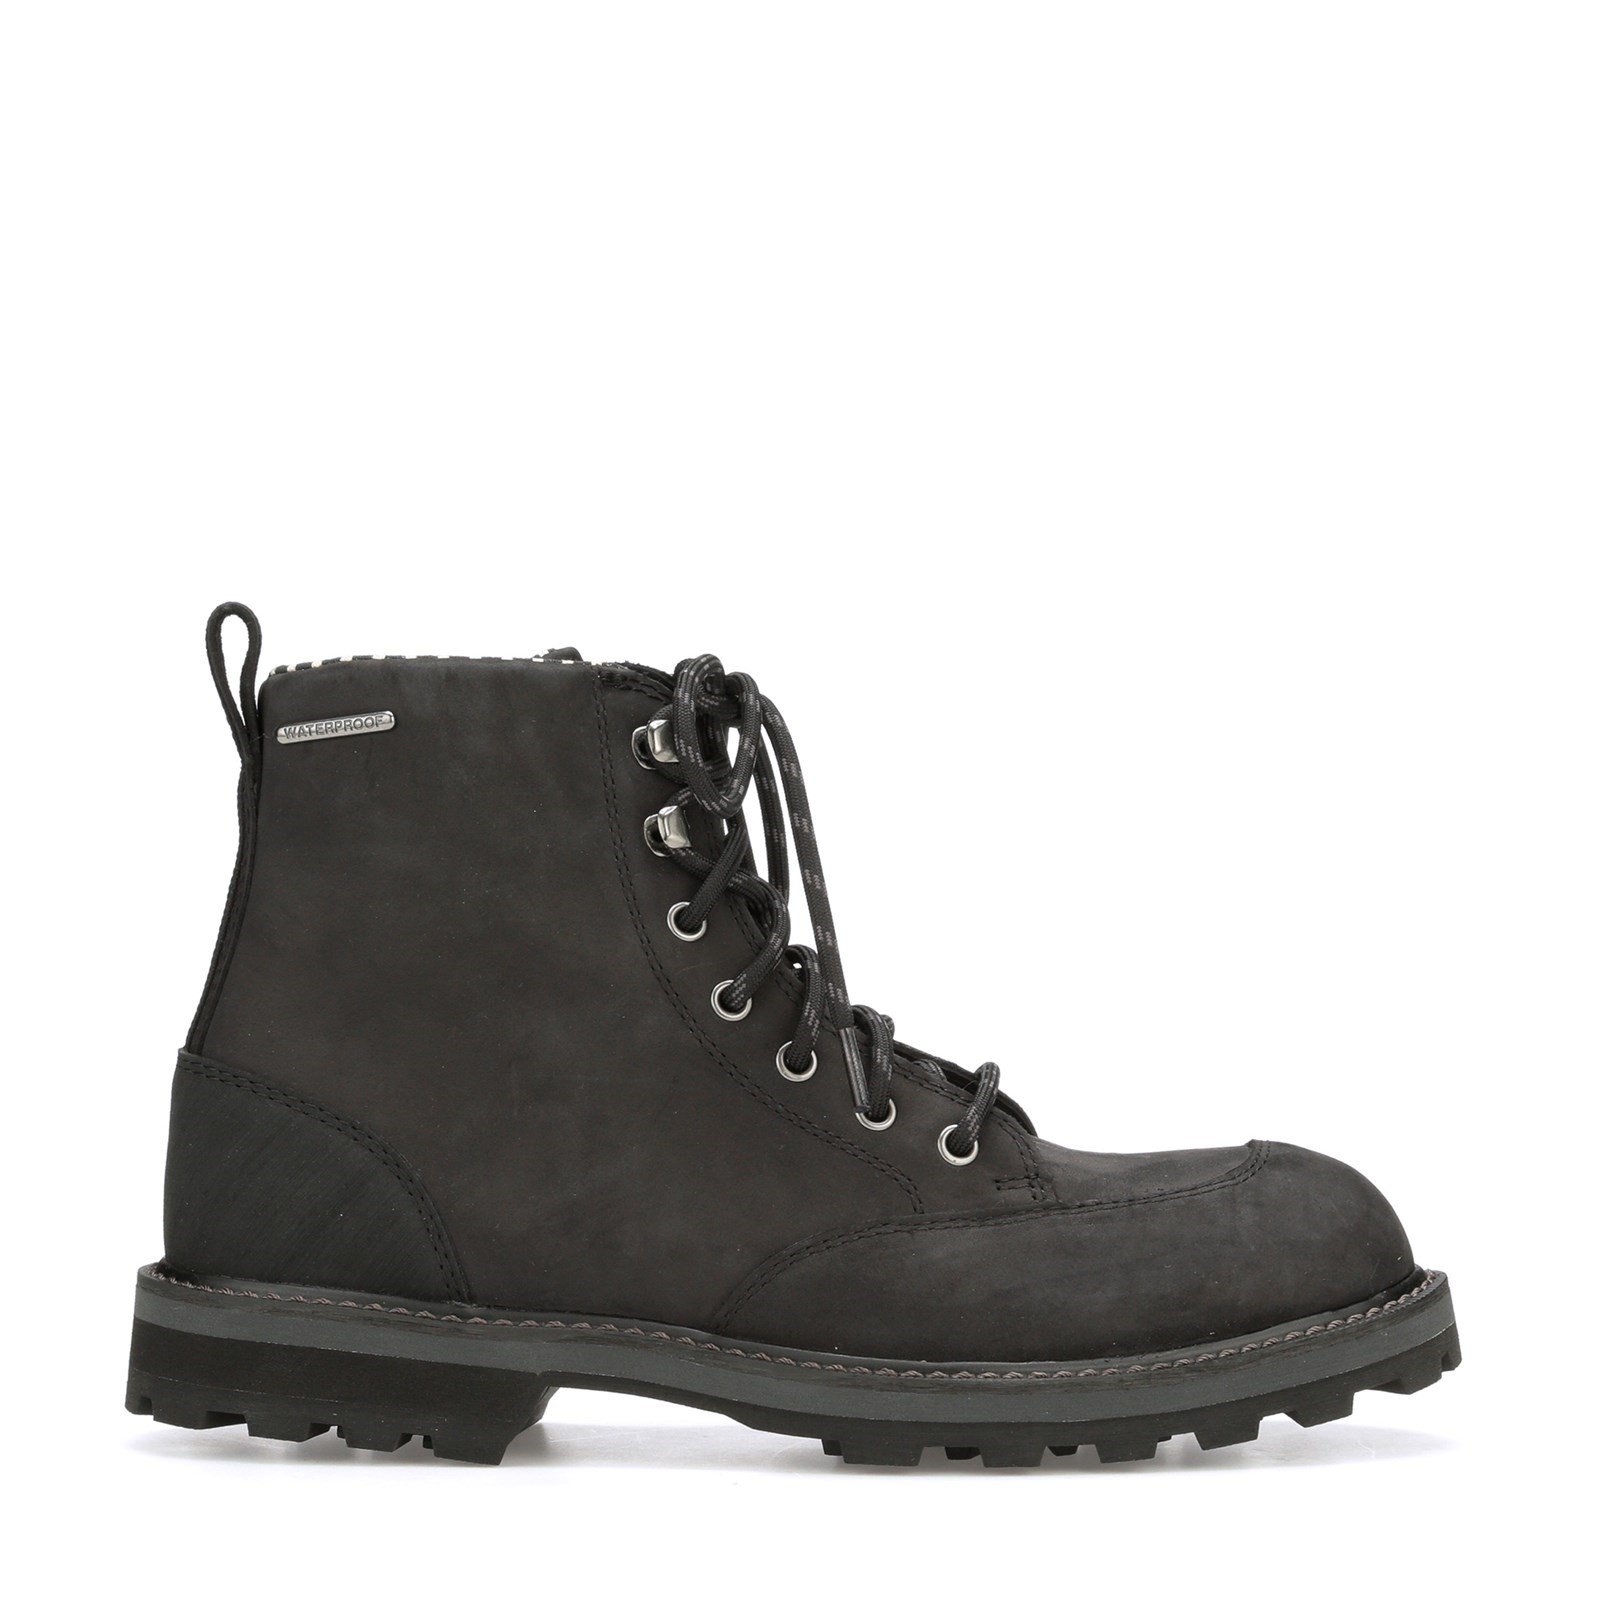 Muck Boots Men's Foreman Boot Black 31854 - Black 8